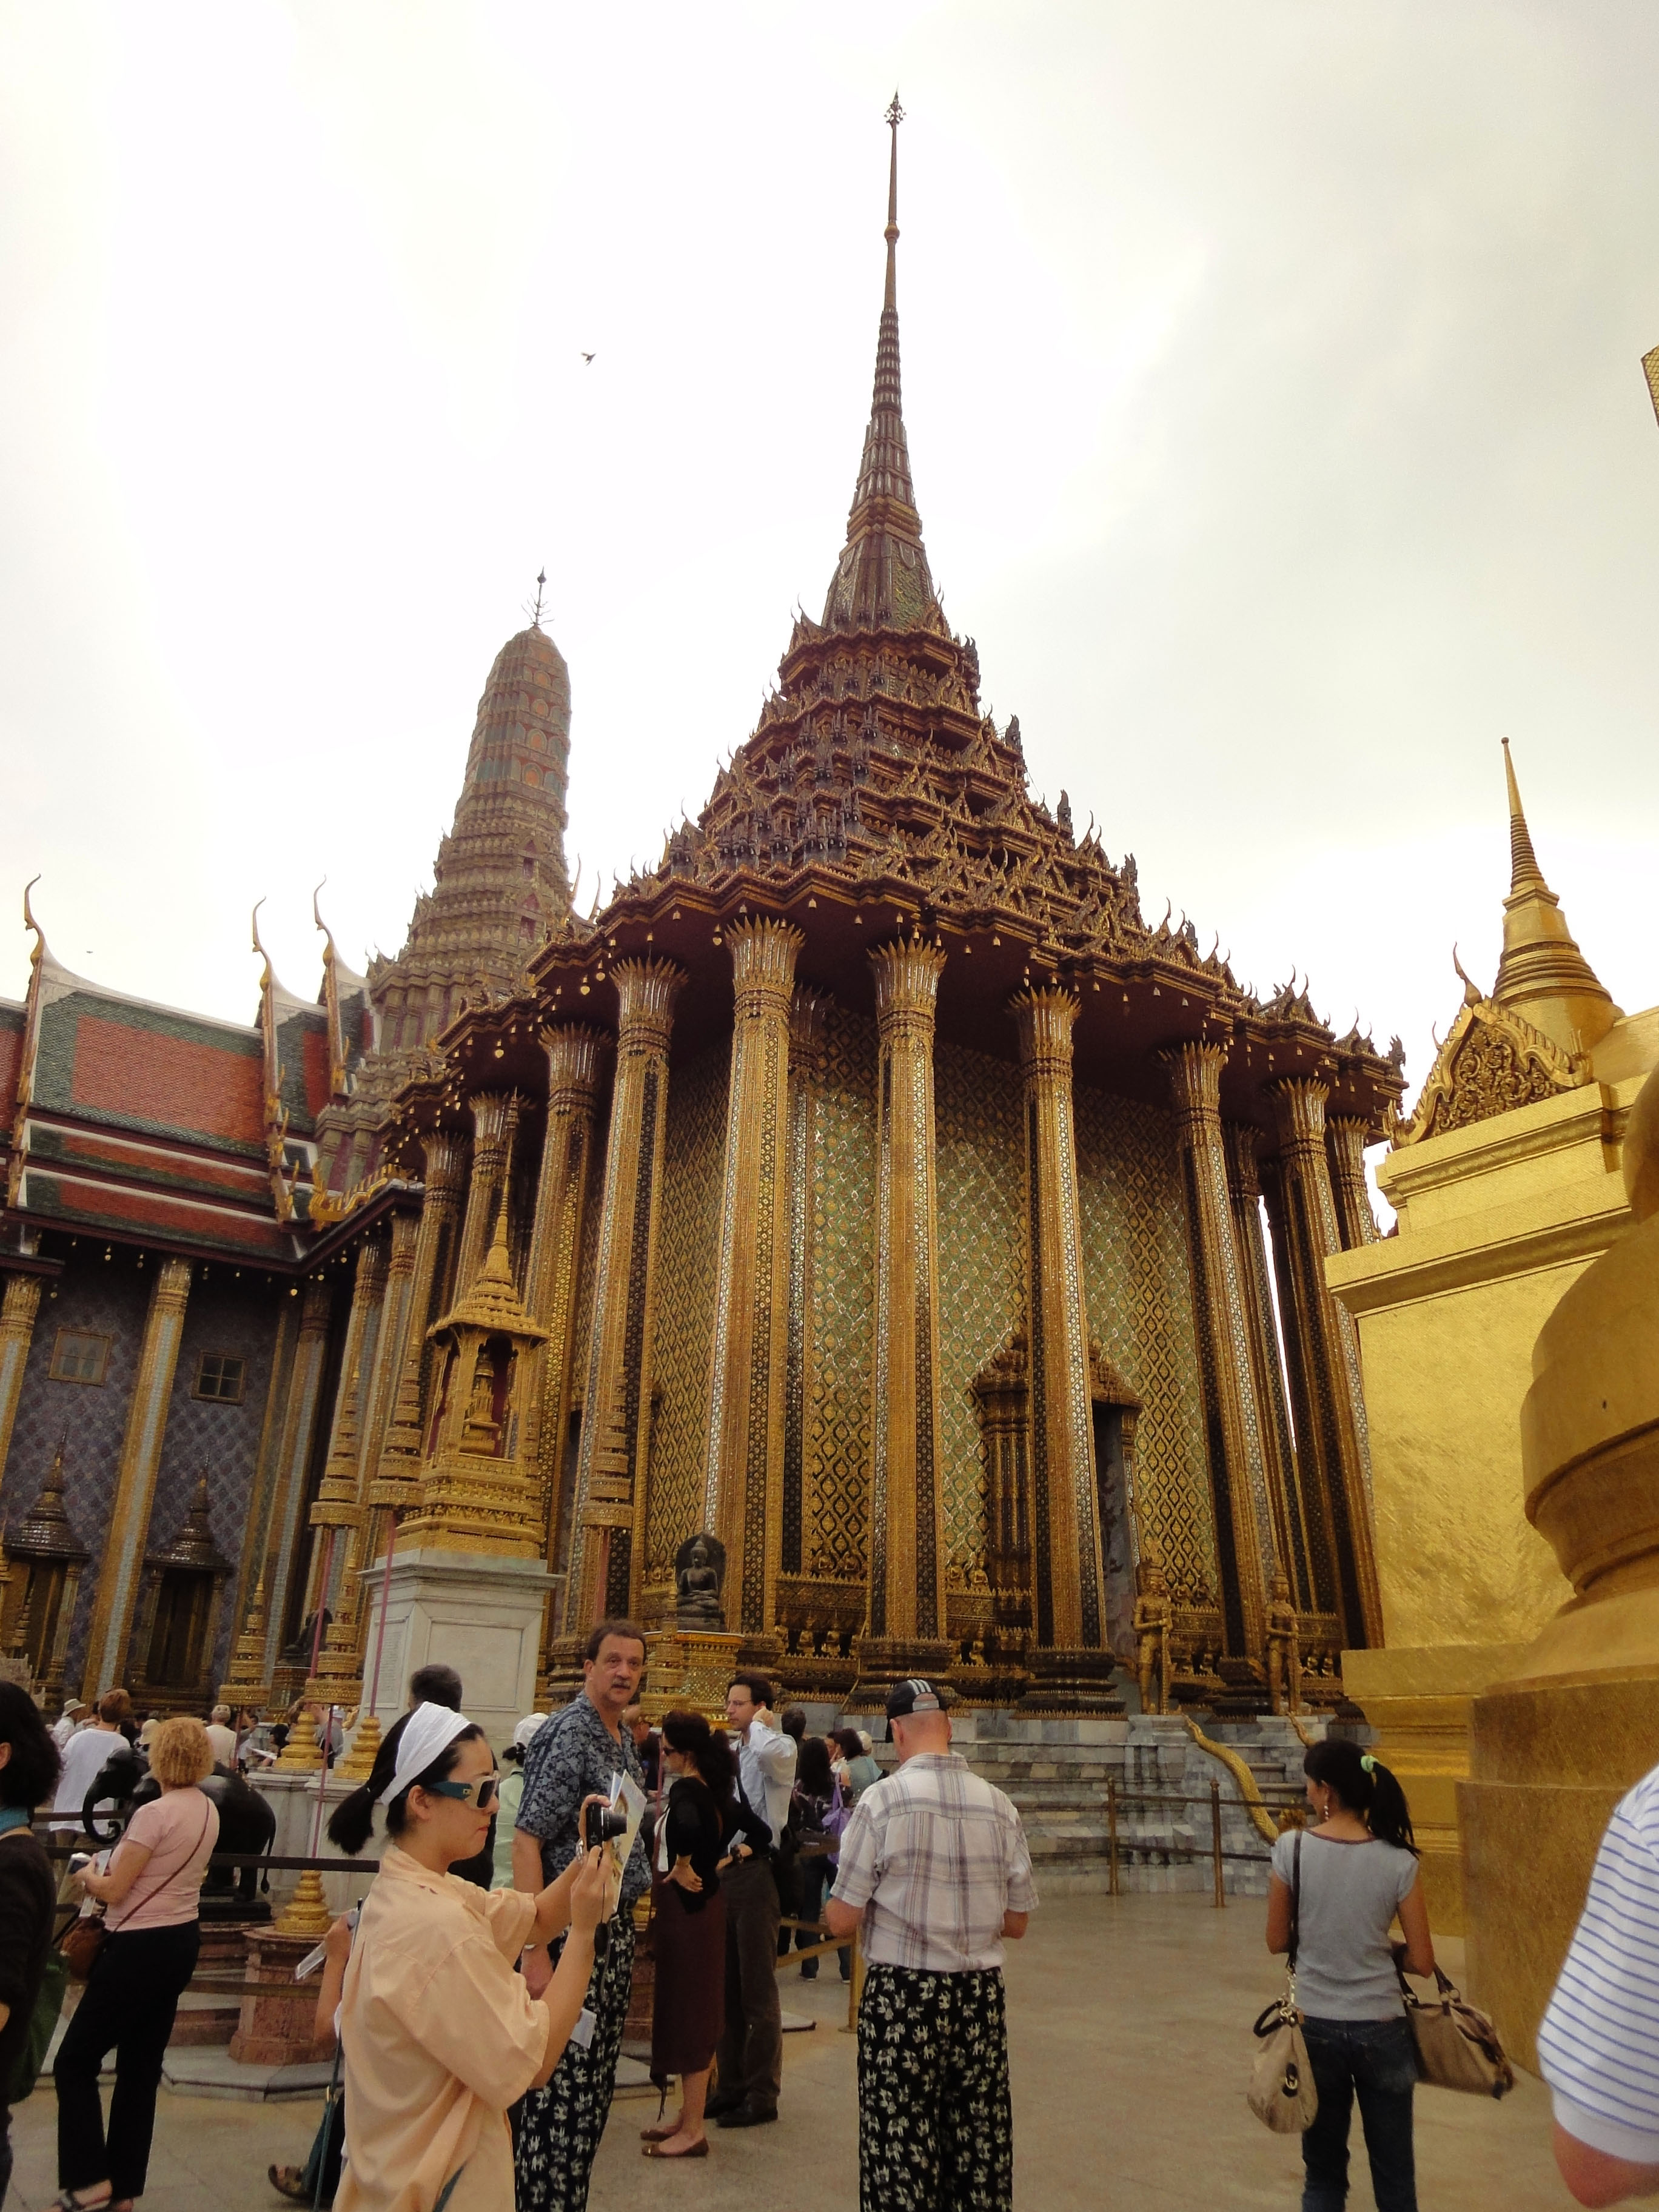 07 Phra Mondop Grand Palace Bangkok 2010 03